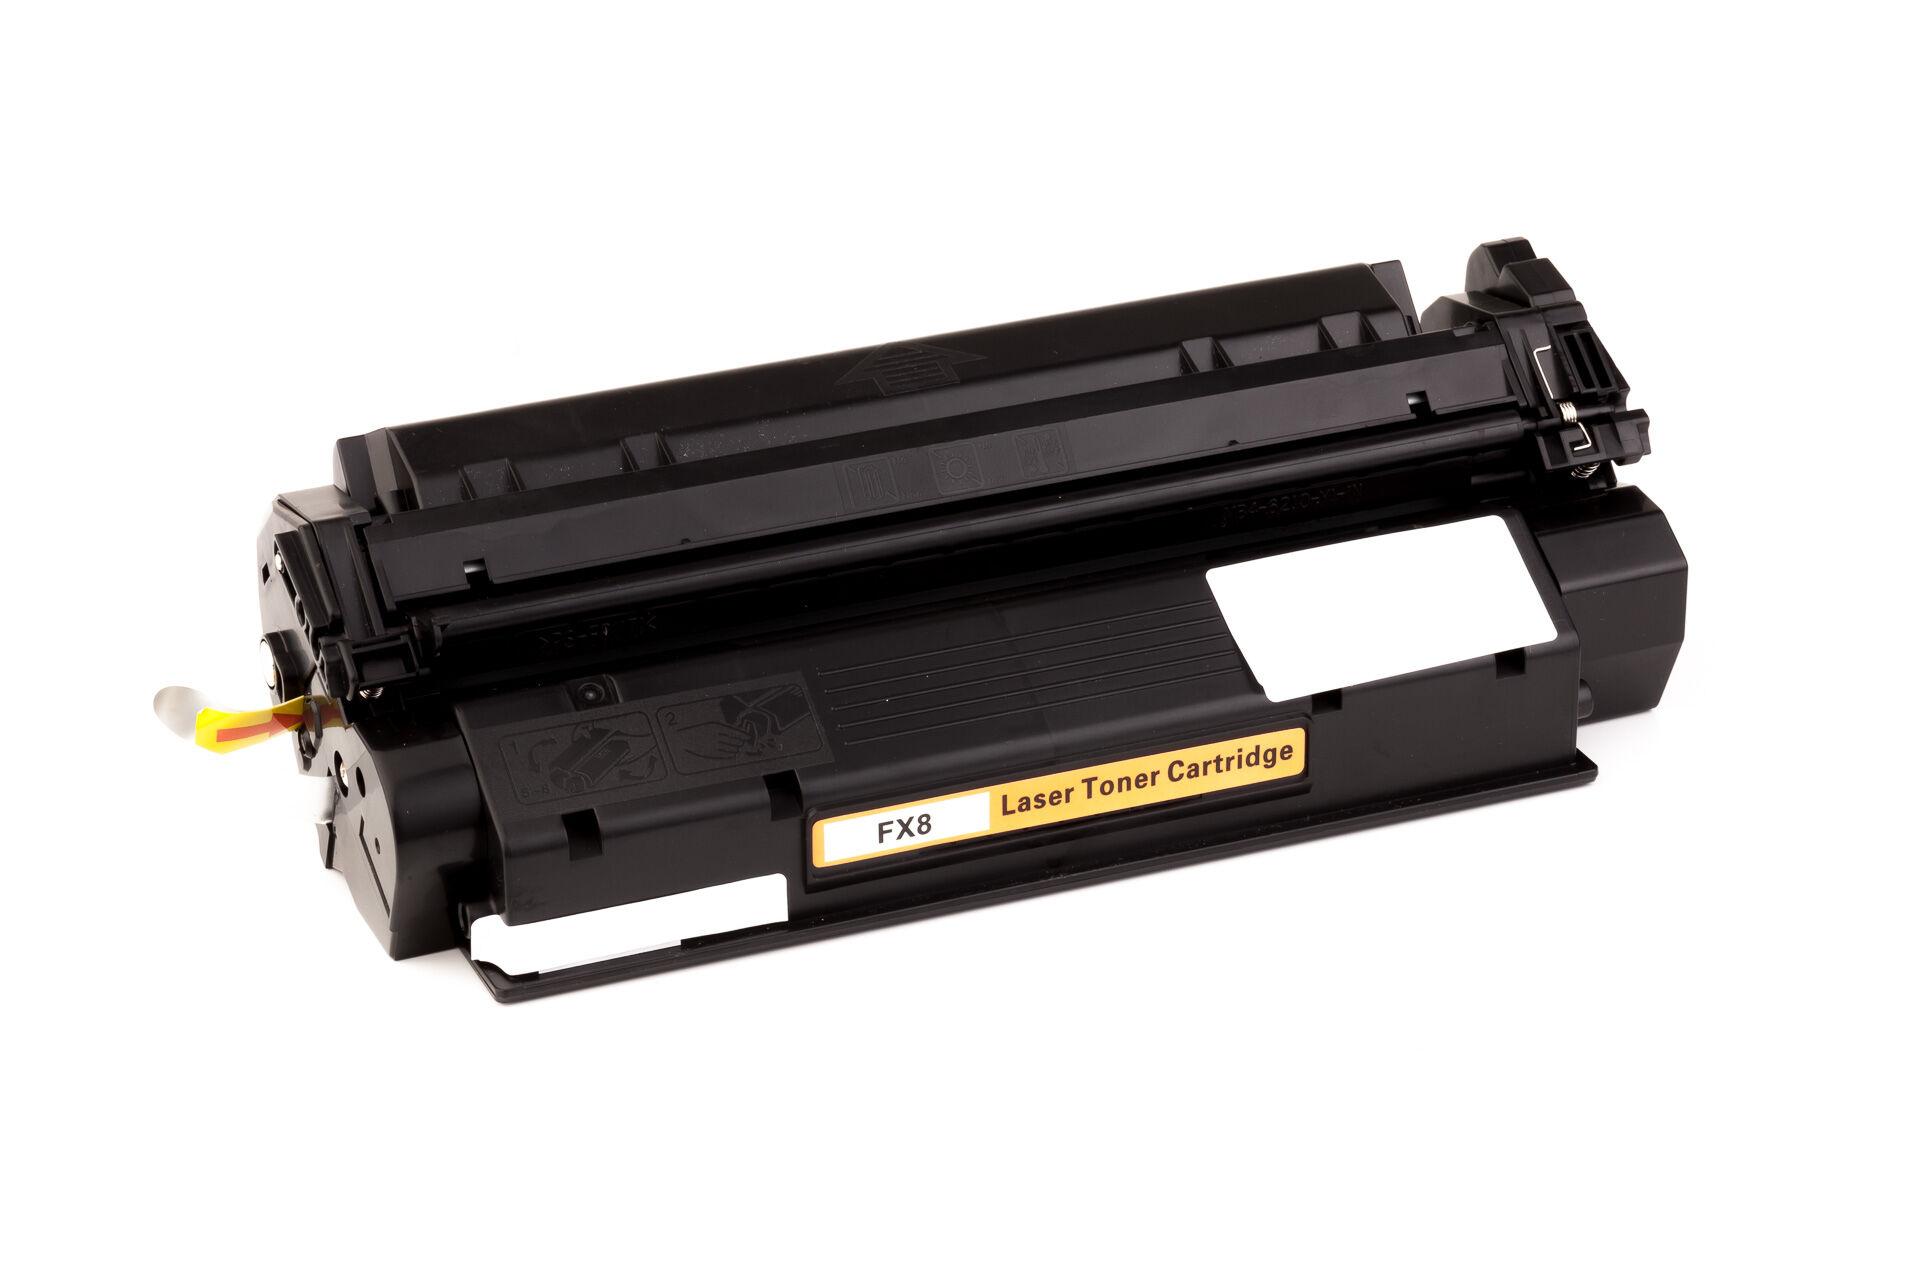 Canon Cartouche de Toner pour Canon 7833A002 / CARTRIDGE T noir compatible (de marque ASC)